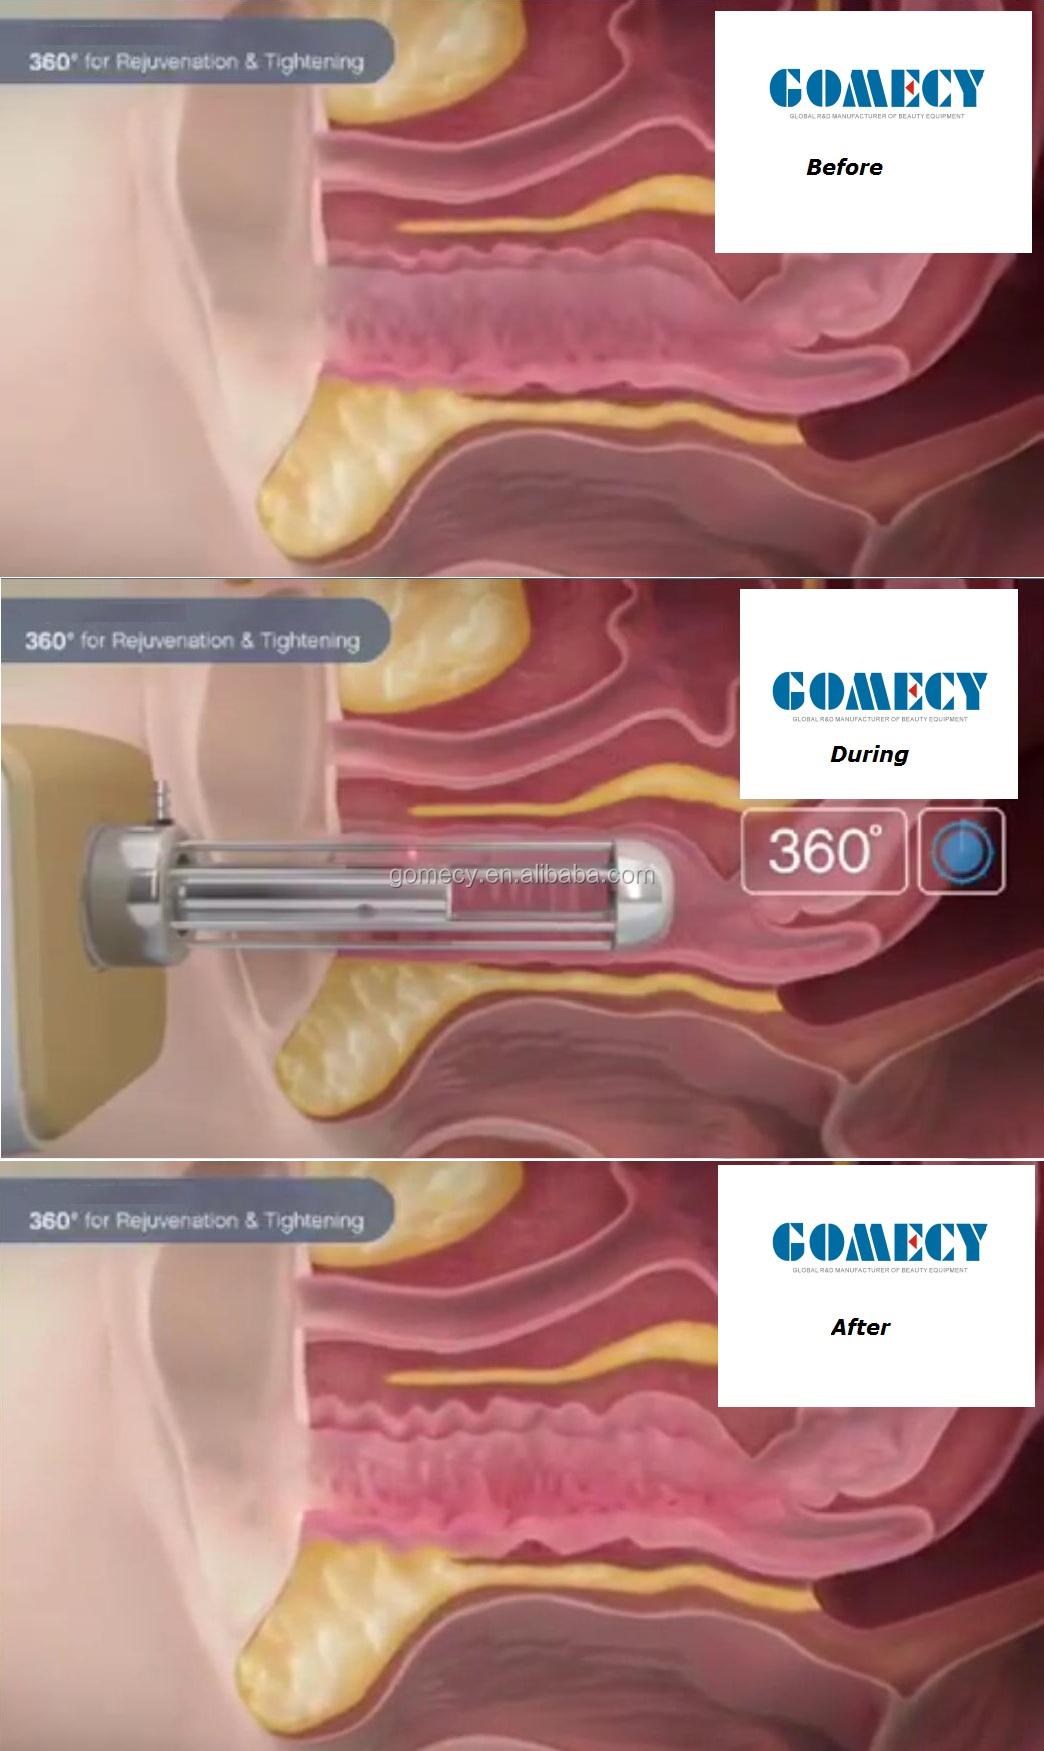 co2 fraction gynecology.jpg